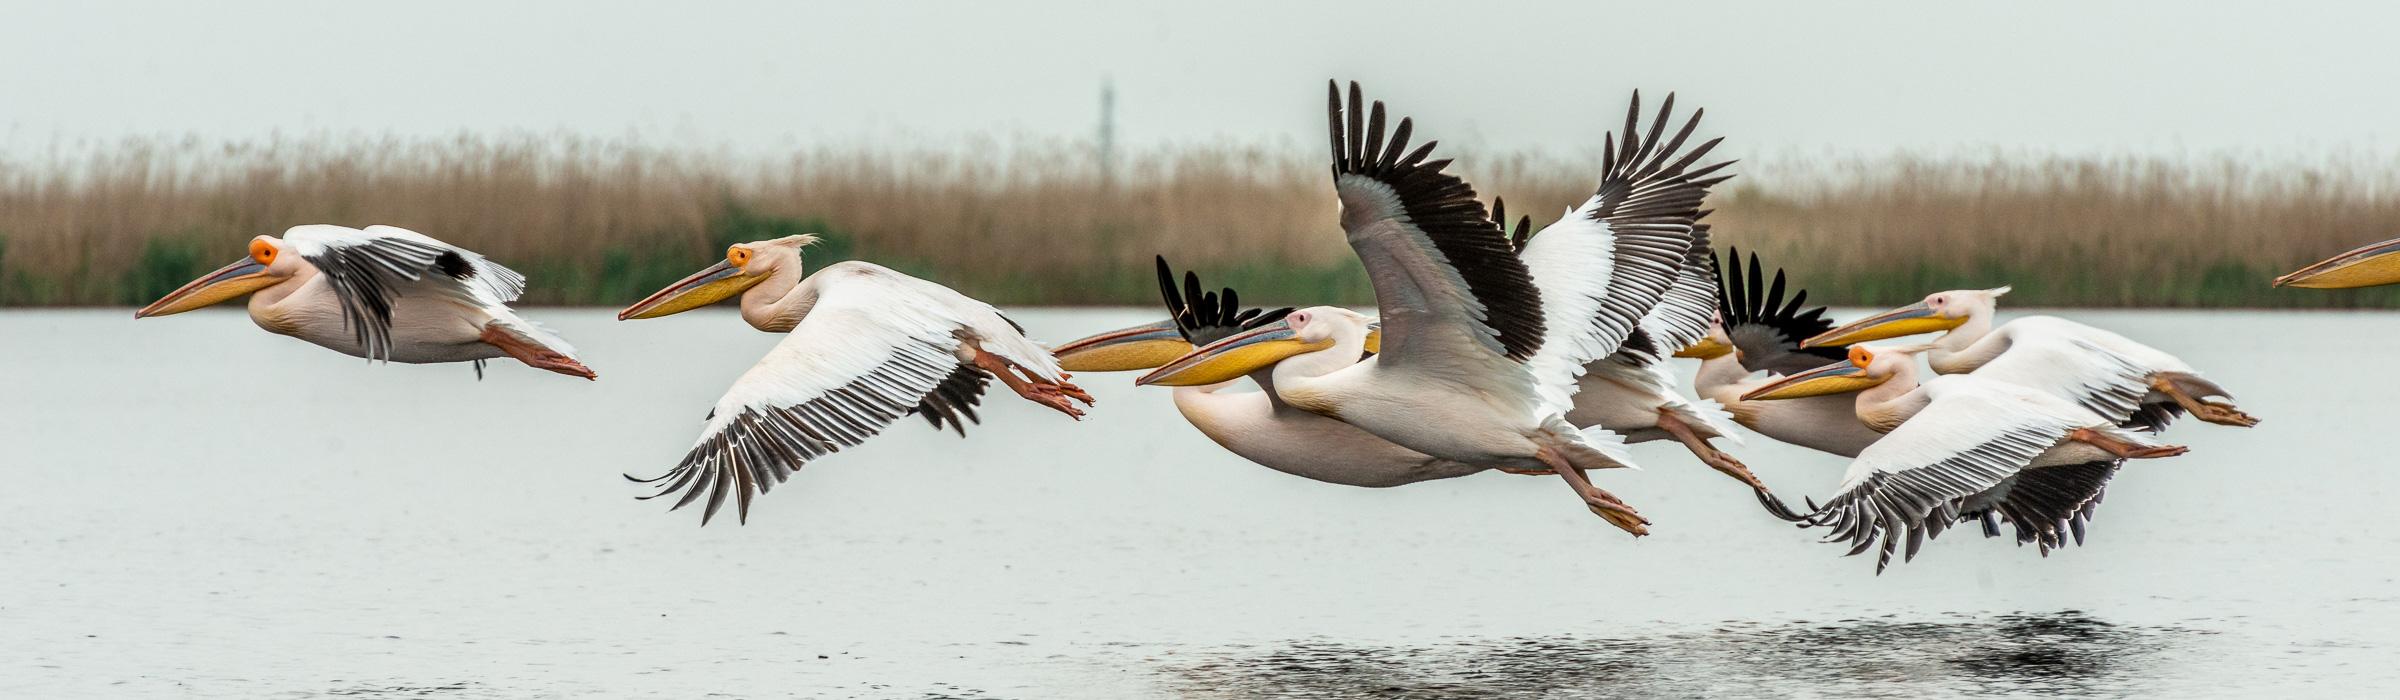 Rosa Pelikane im Donaudelta